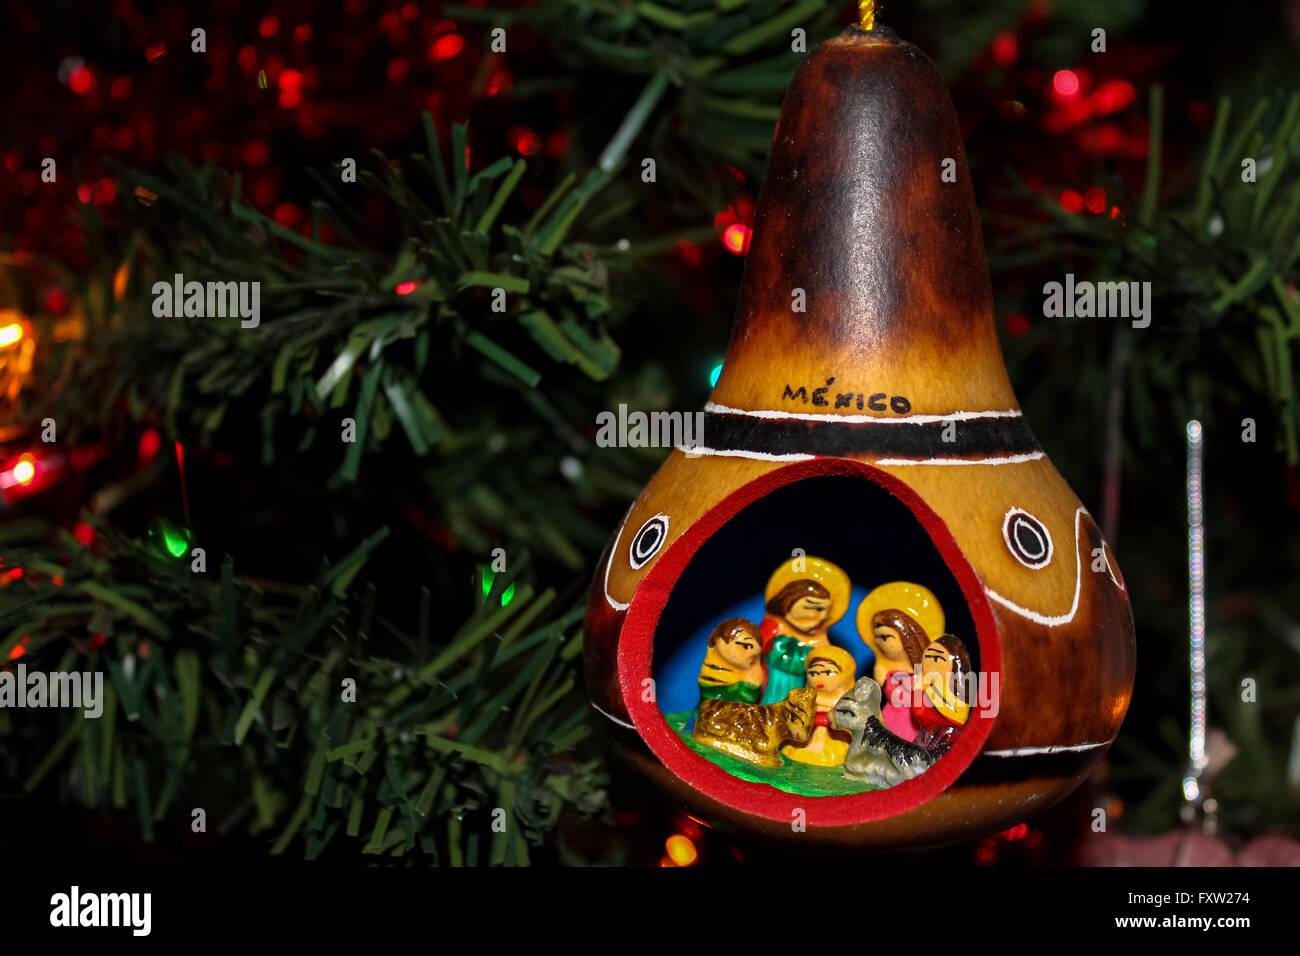 Nativity Christmas Tree Ornament Stock Photo Alamy